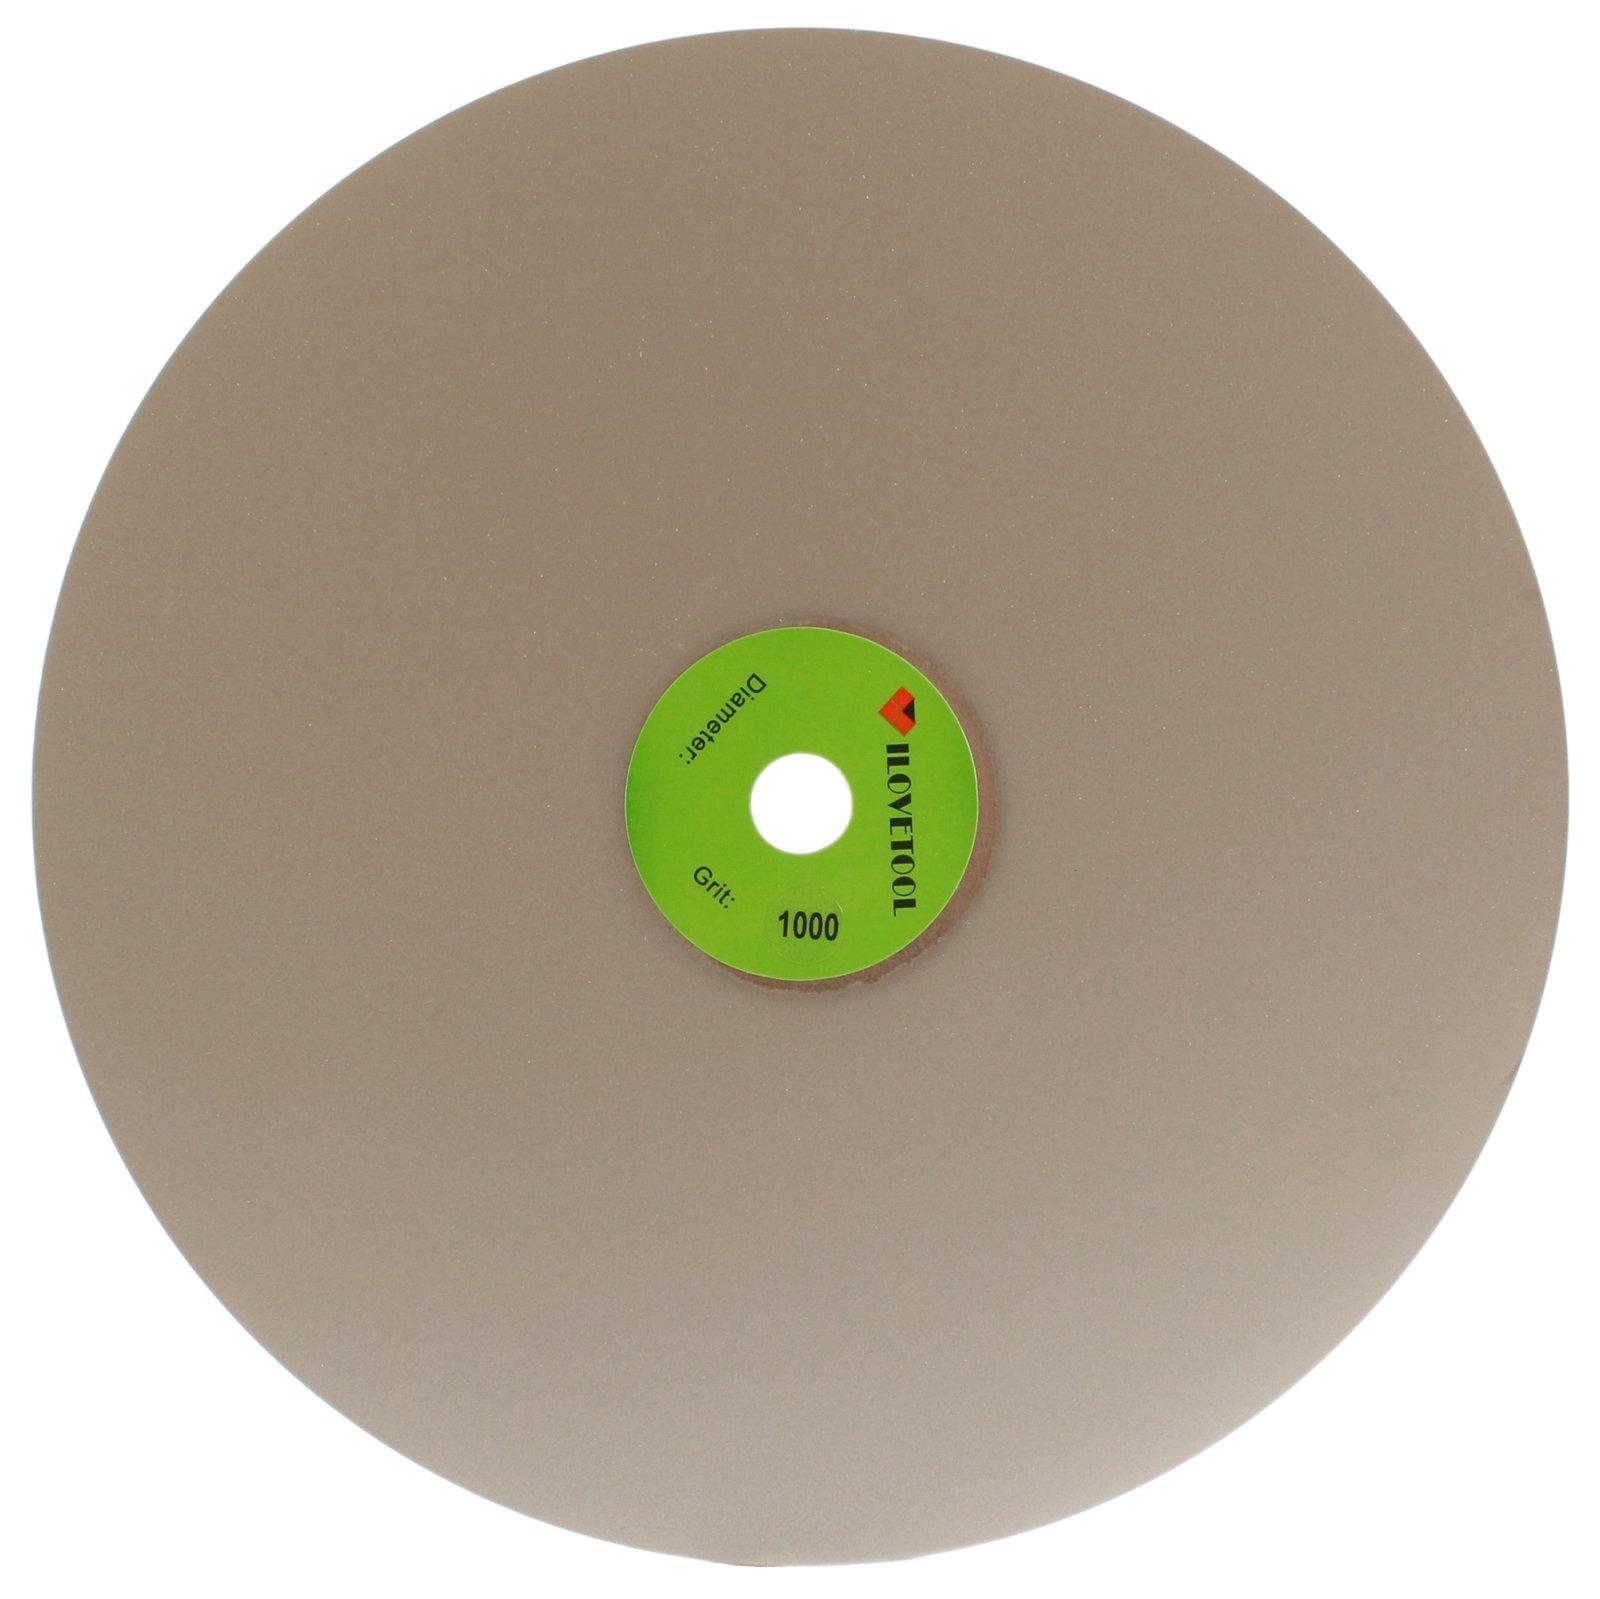 ILOVETOOL 350mm Diamond Discs Super Fine Grinding Wheel 1000 Grit Jewelry Tools Stone